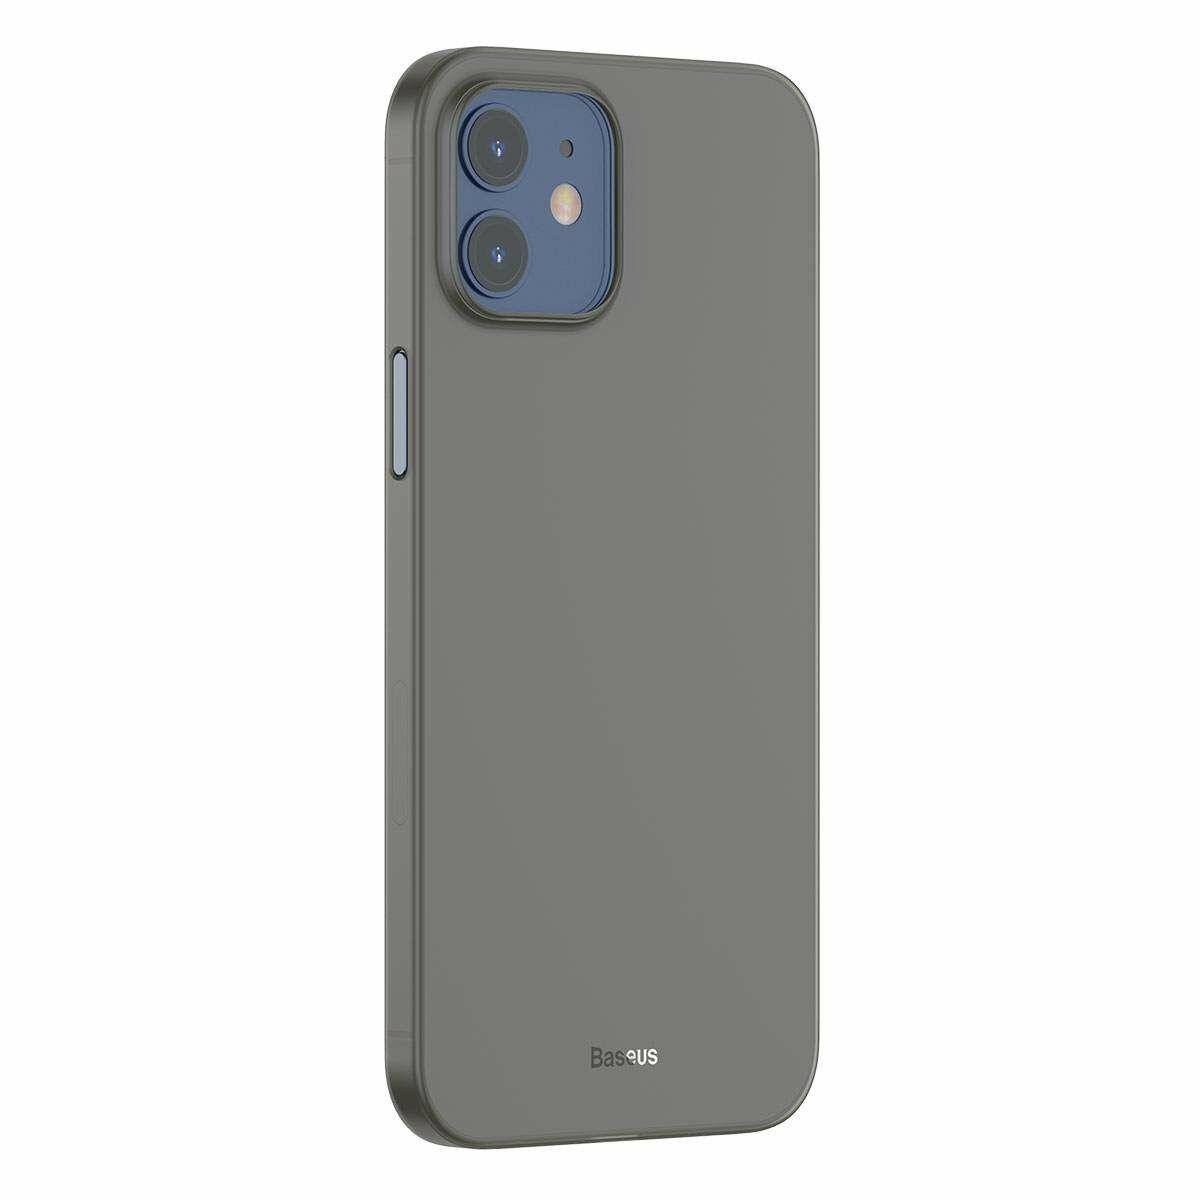 Baseus iPhone 12 mini tok, Wing, fekete (WIAPIPH54N-01)